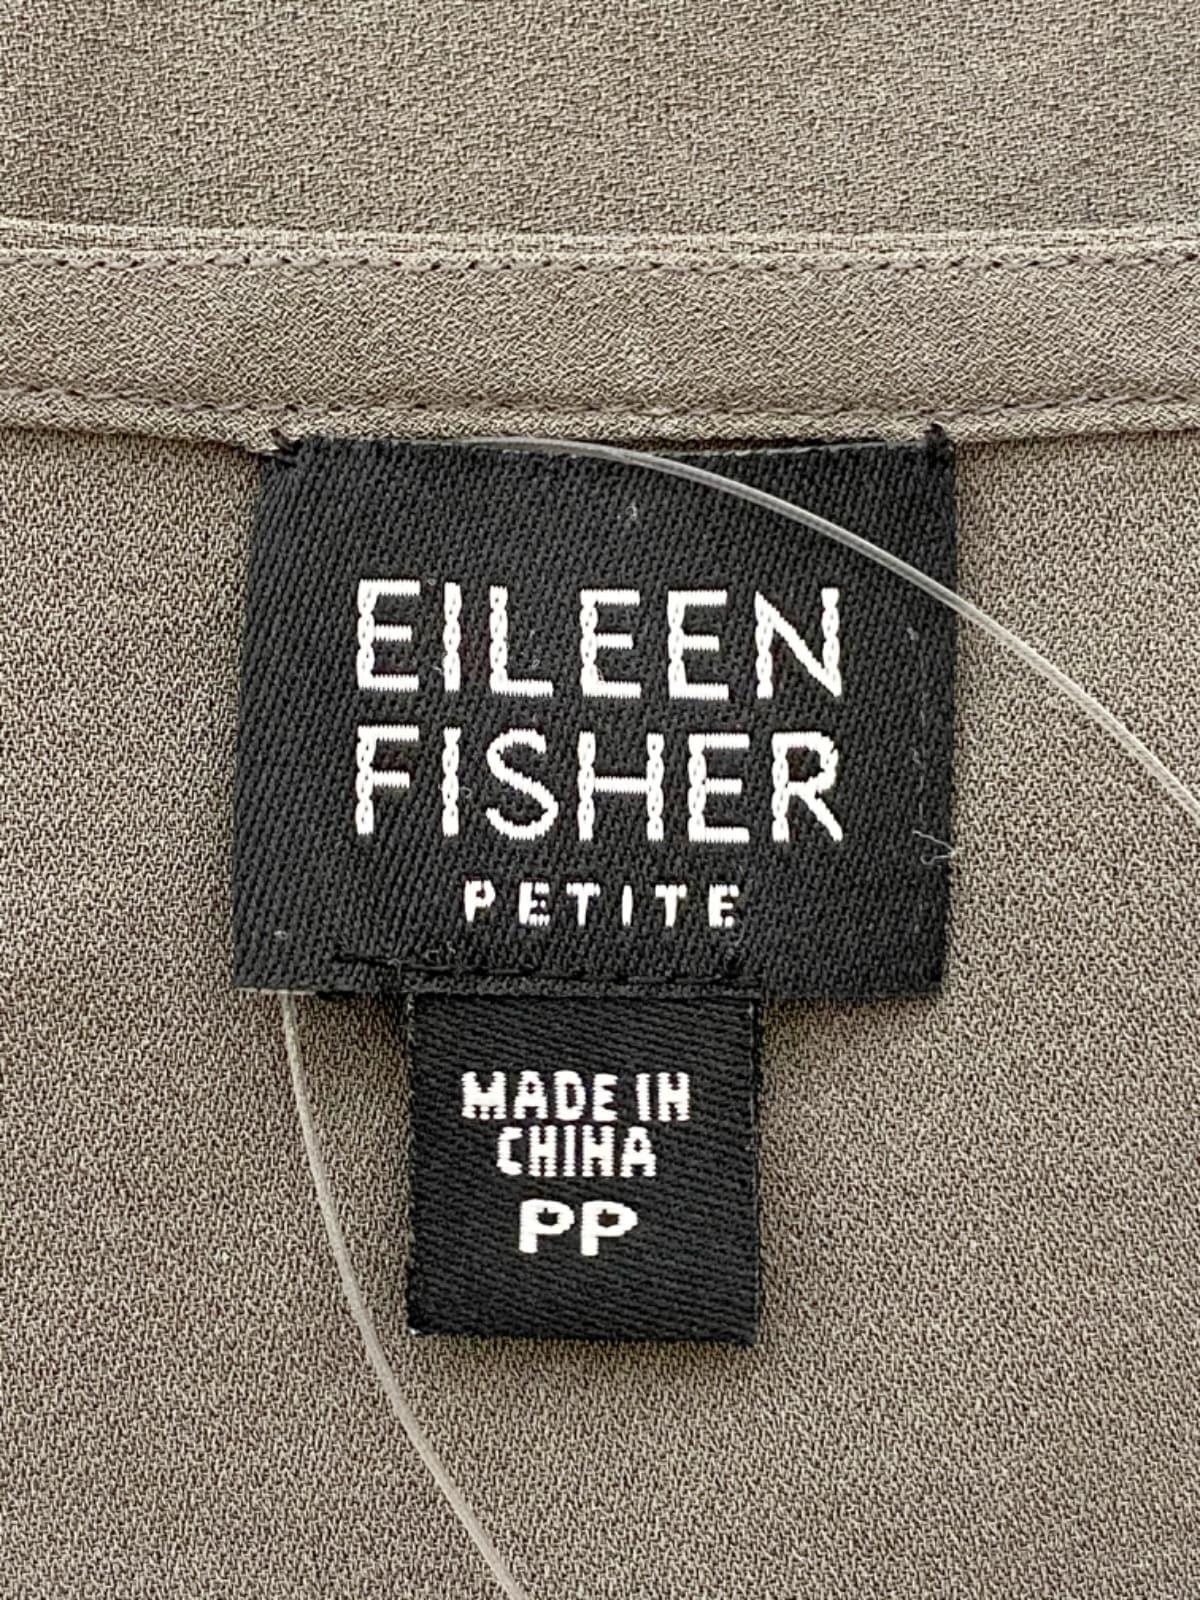 EILEEN FISFER(アイリーンフィッシャー)のカットソー